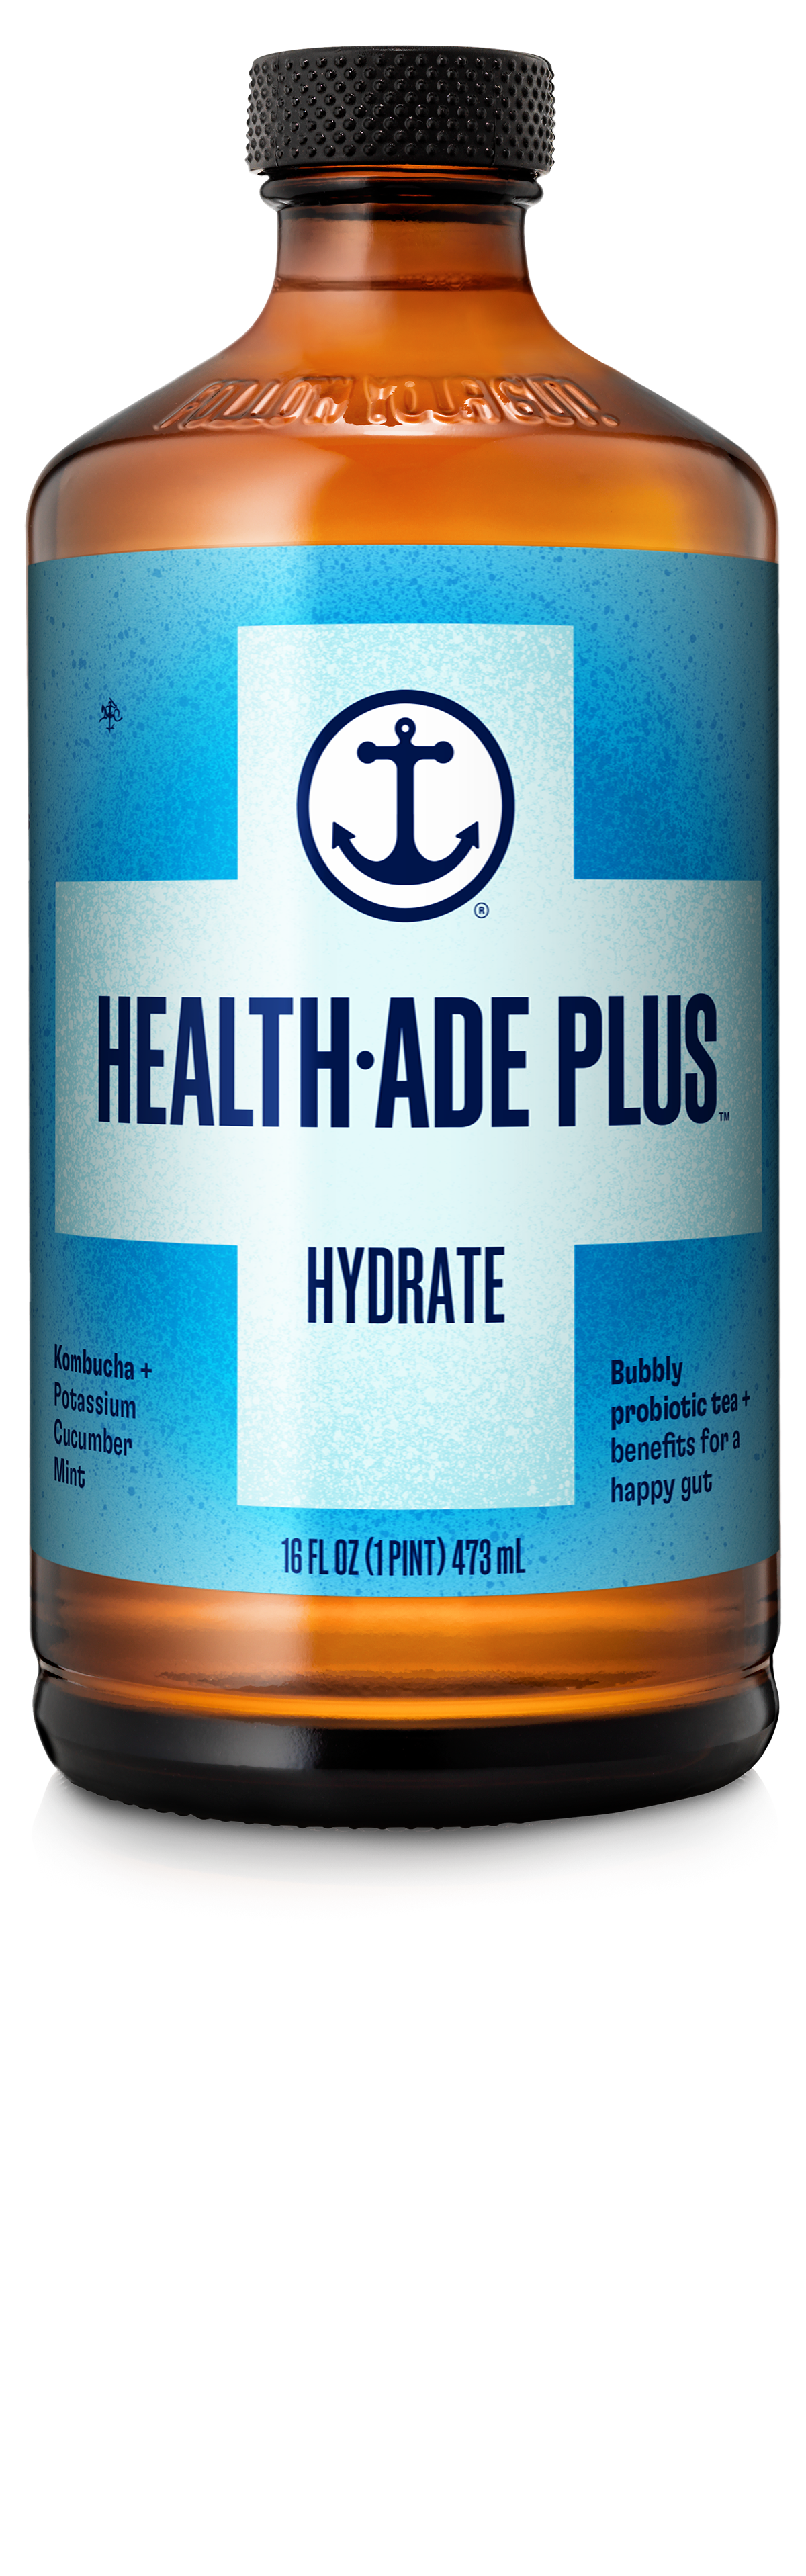 Health-Ade PLUS Hydrate